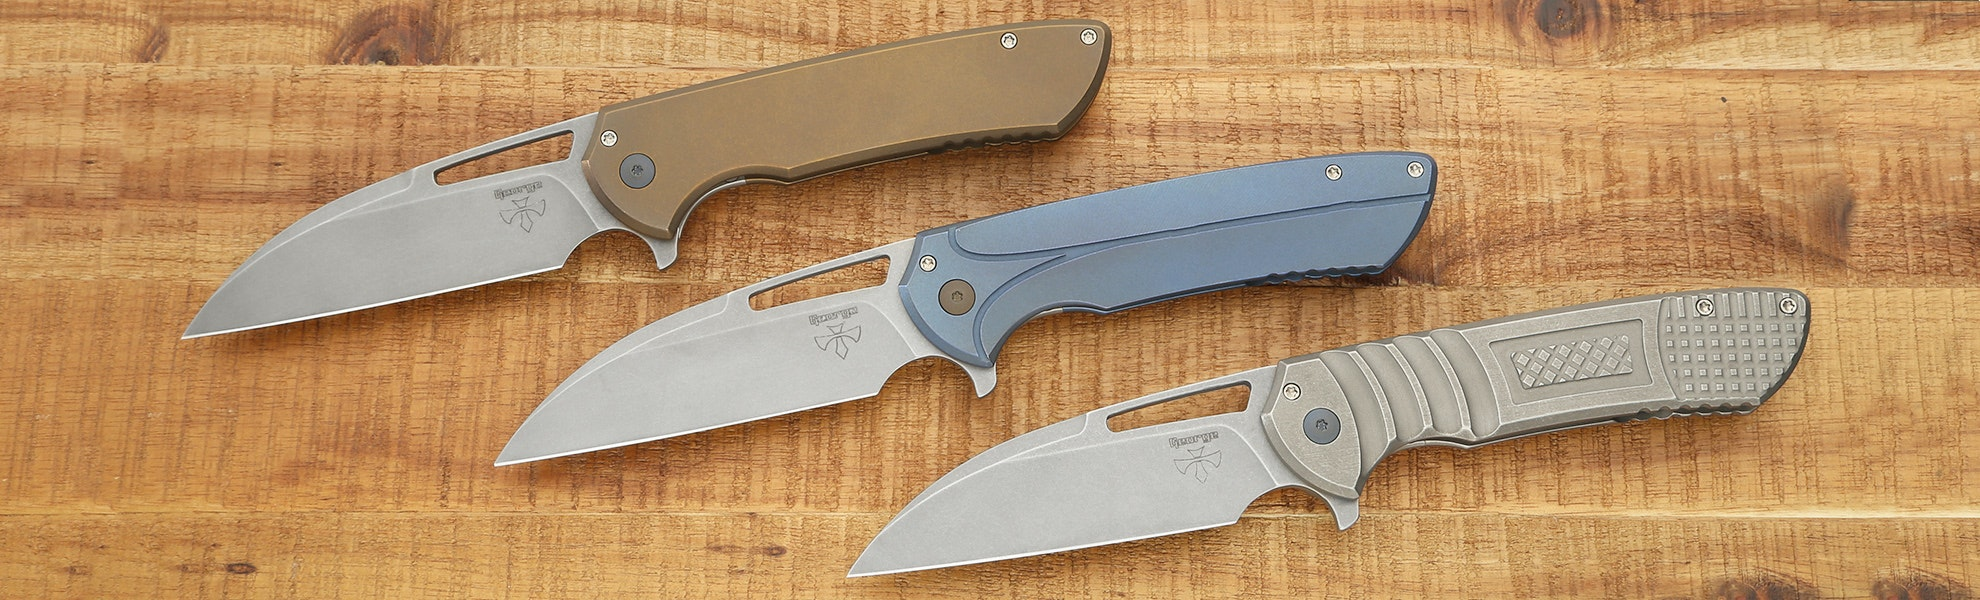 Ferrum Forge Knife Works Masterblaster